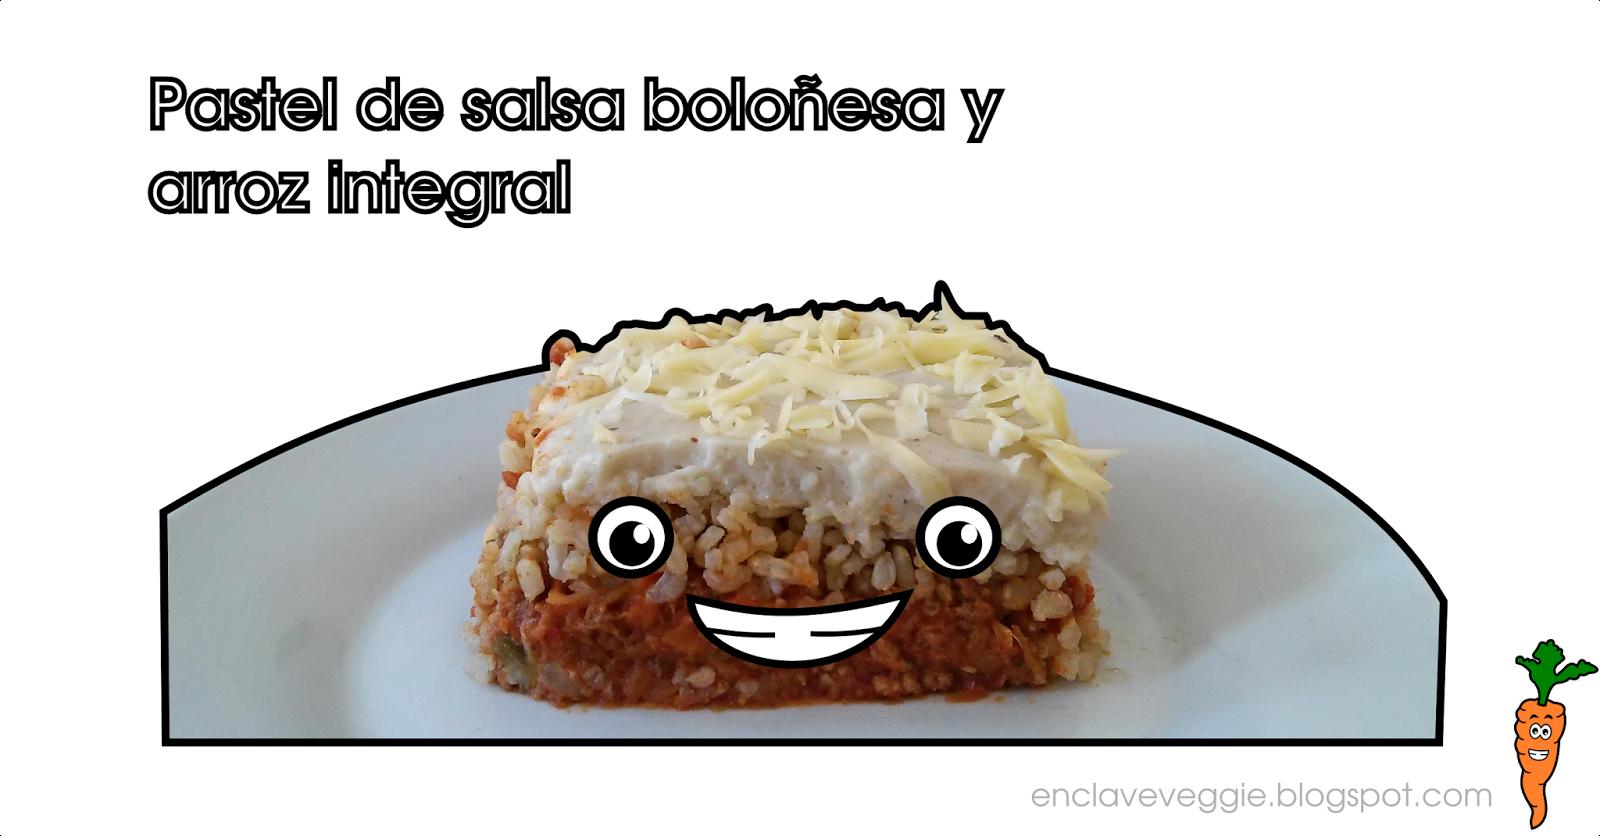 http://enclaveveggie.blogspot.com/2015/04/pastel-de-salsa-bolonesa-y-arroz.html